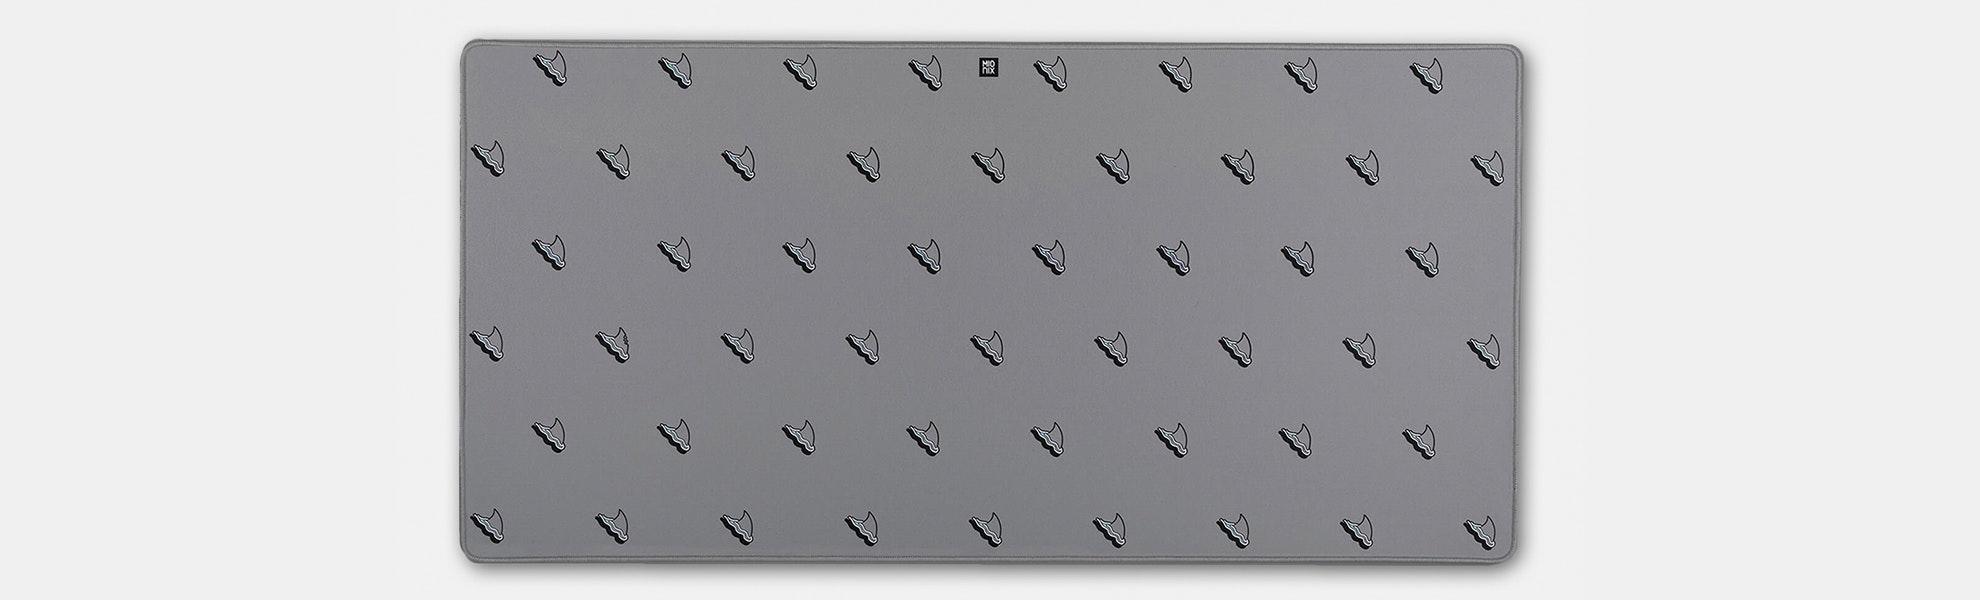 Mionix Desk Pad